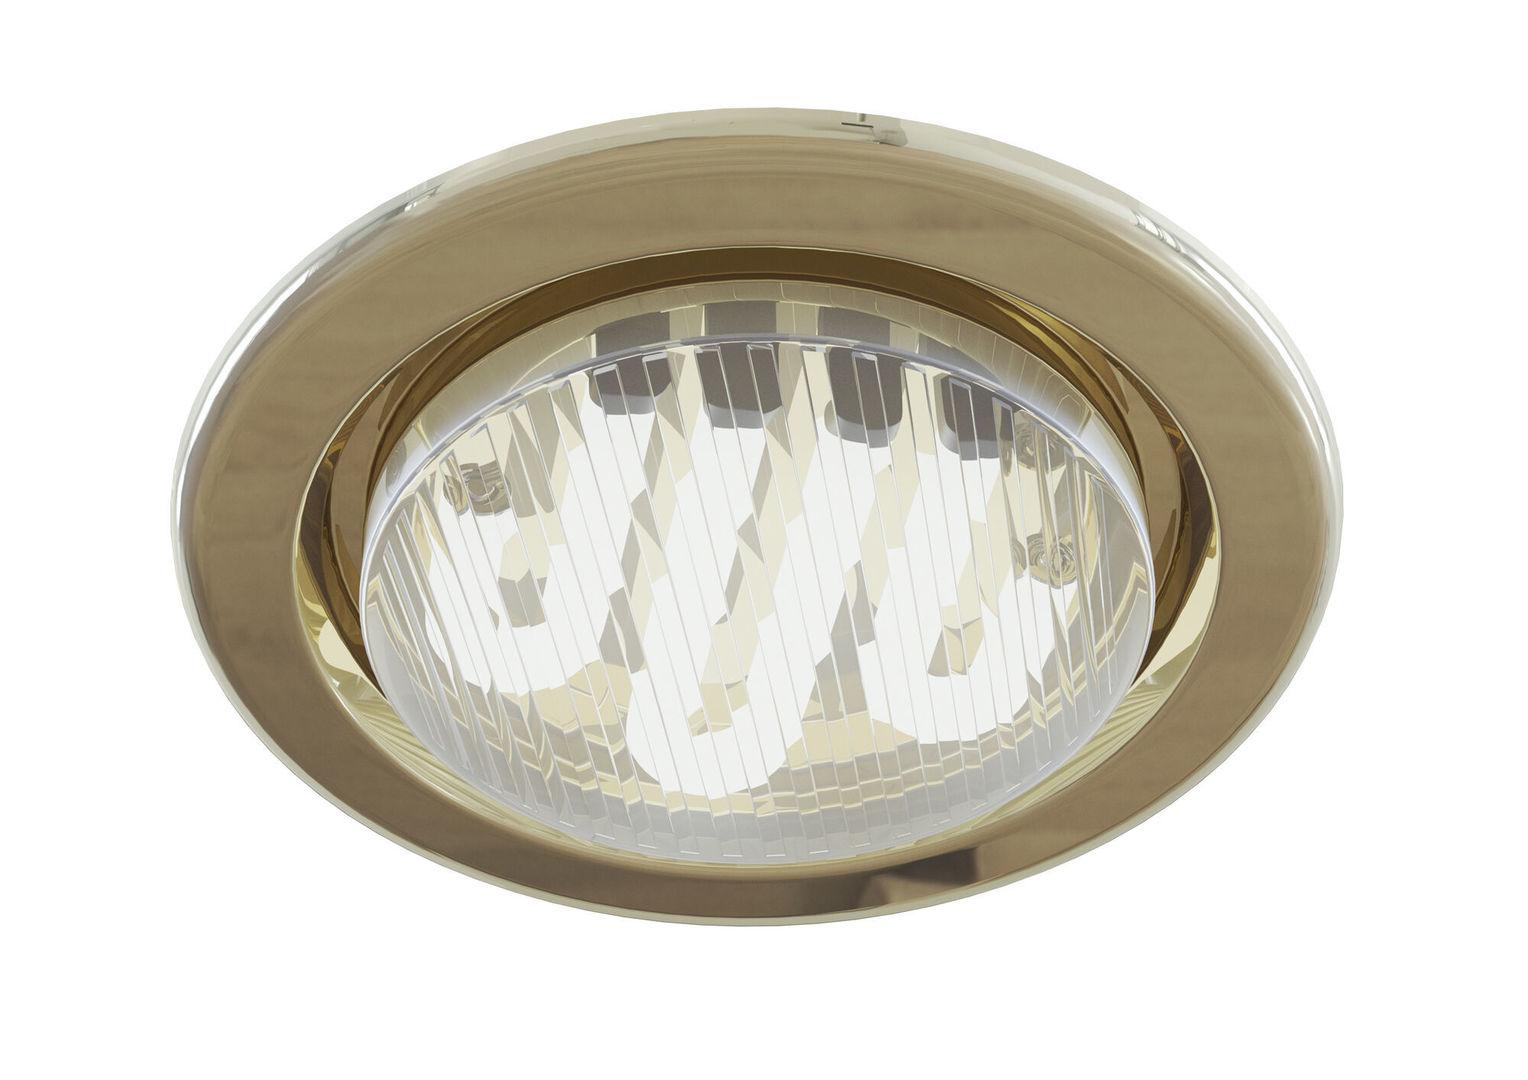 Recessed ceiling luminaire Maytoni Metal Modern DL293-01-G